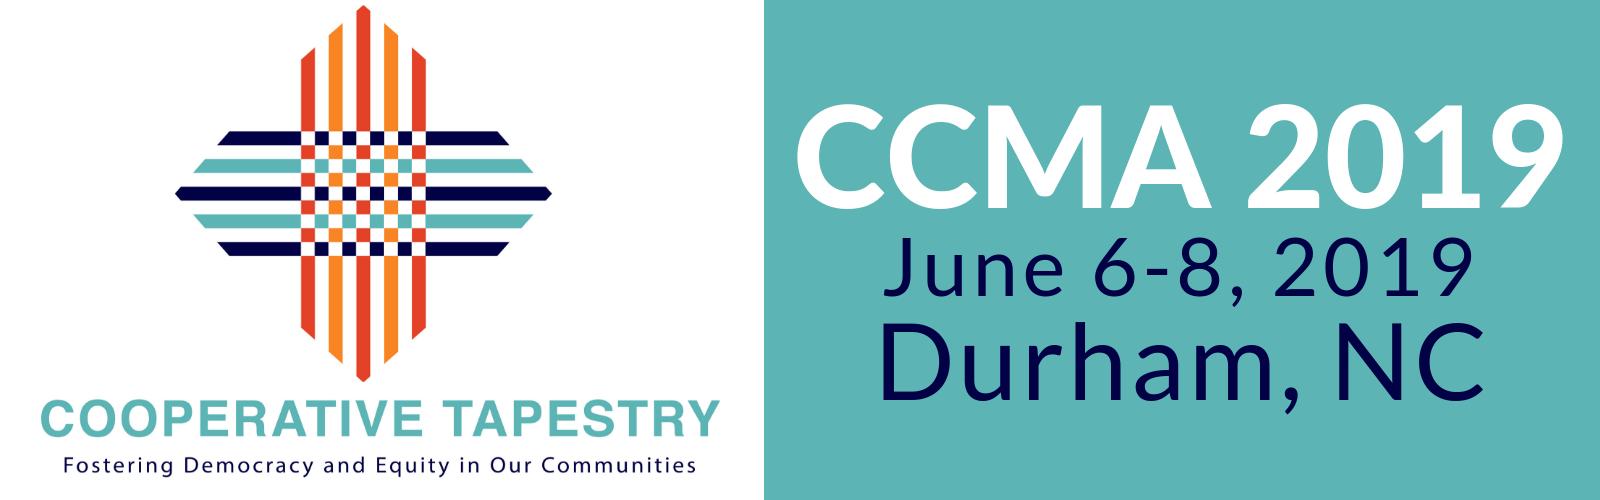 CCMA 2019 logo and theme